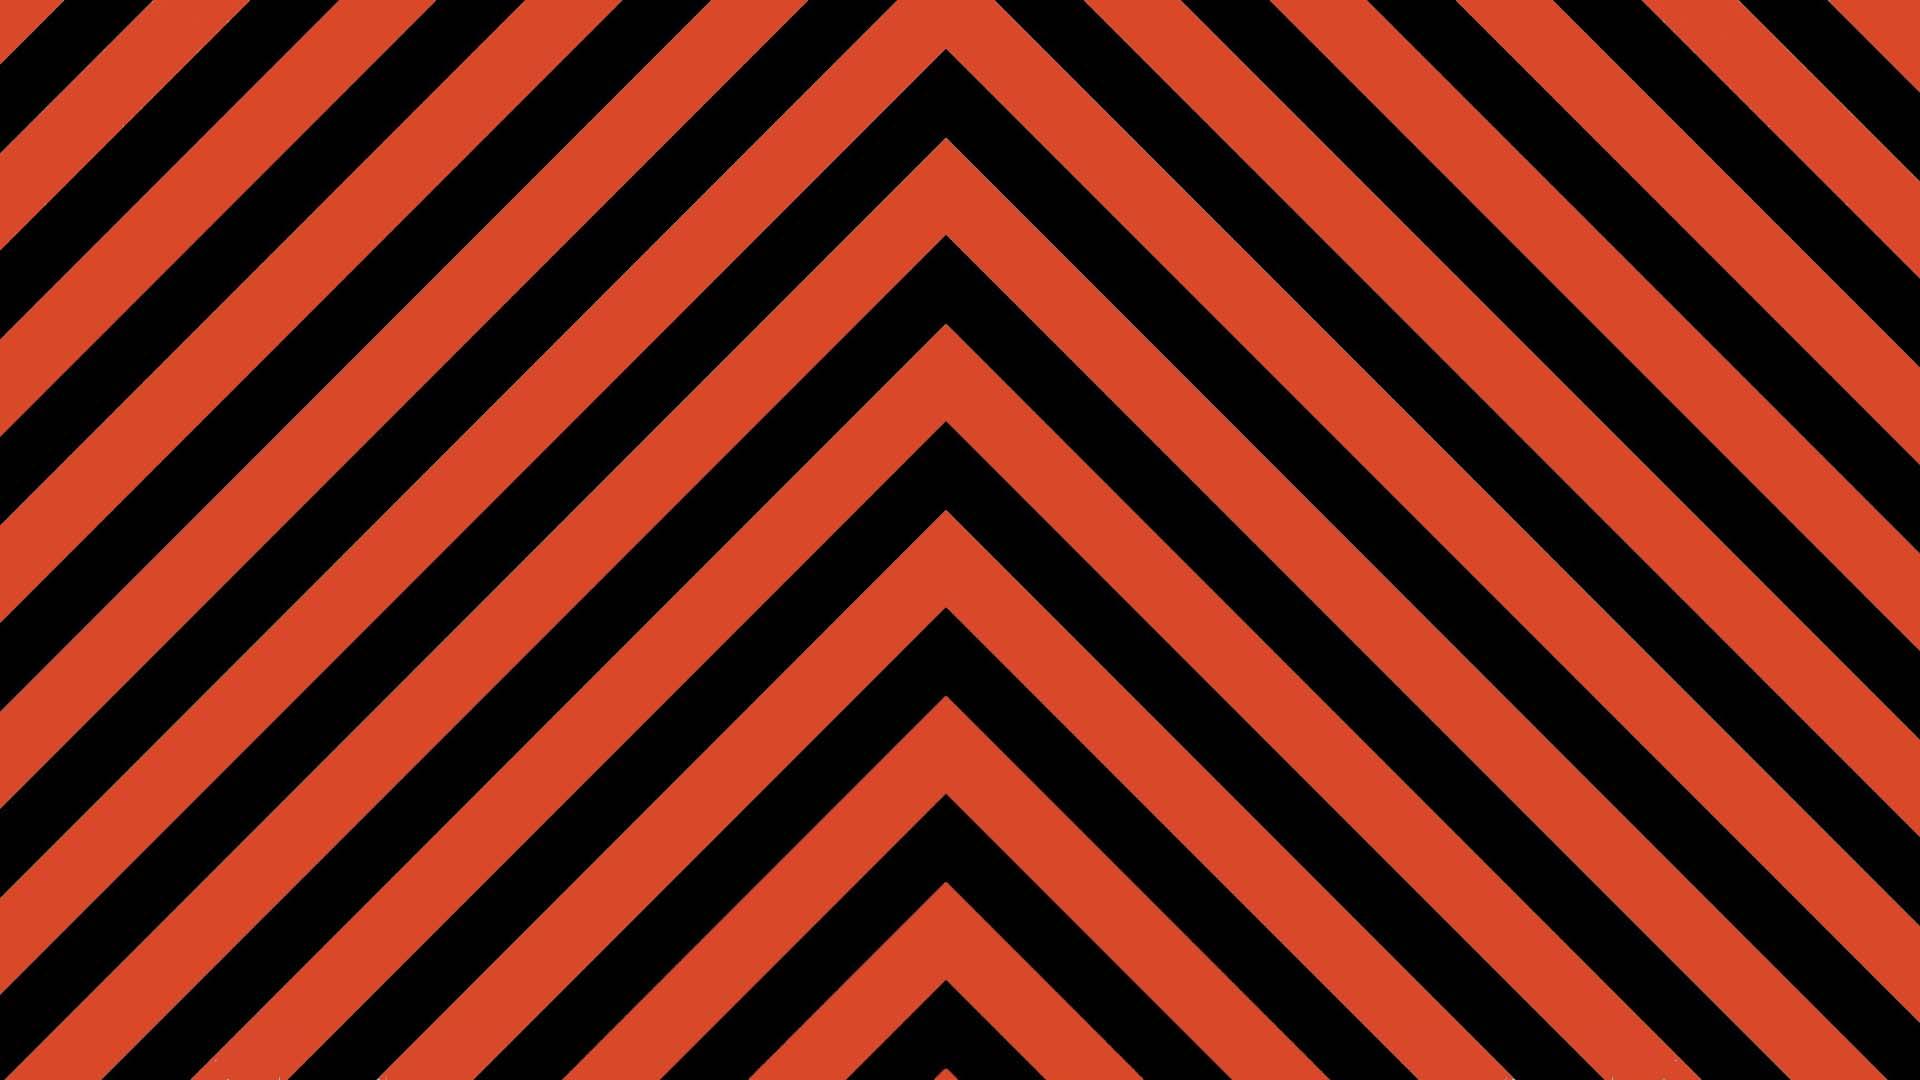 Black Digital Art Geometry Stripes Orange Color 1920x1080